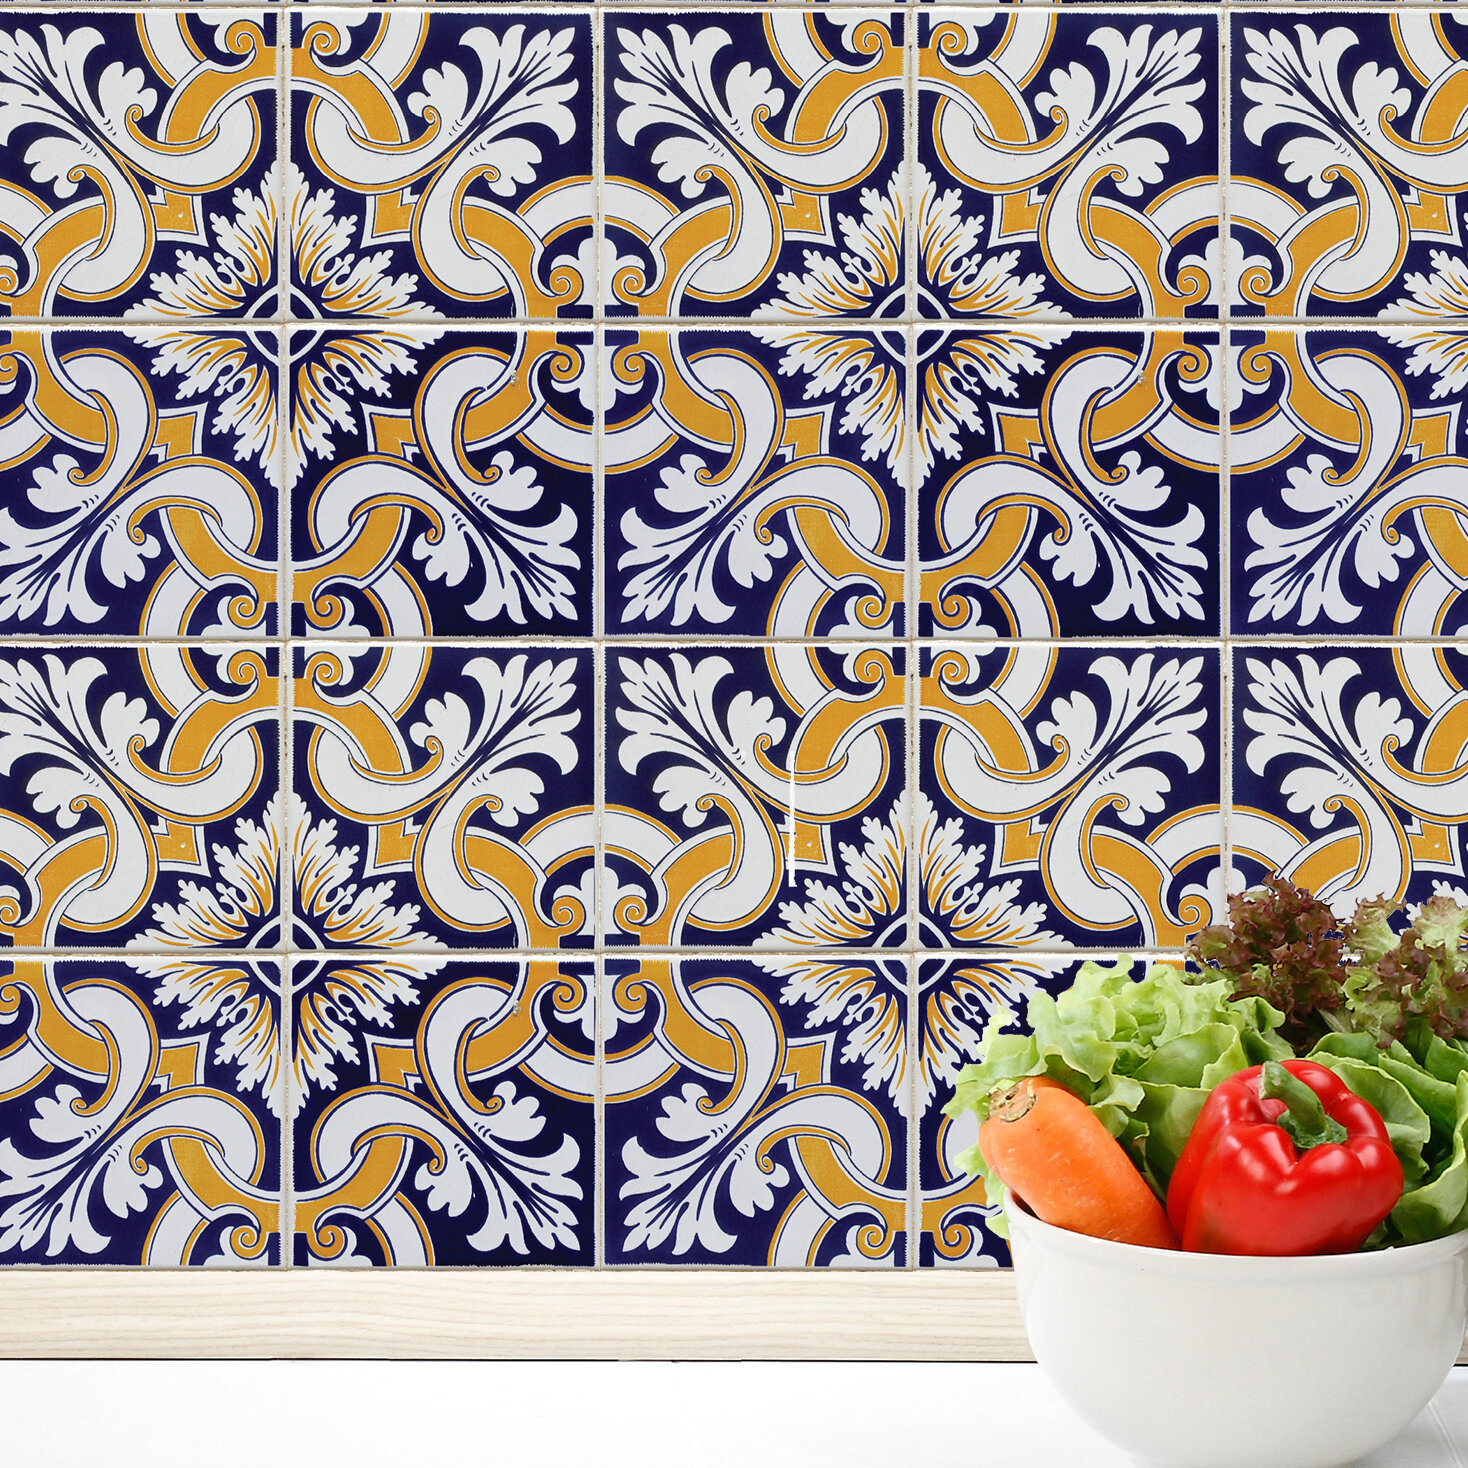 Shower tile decals wayfair talavera tiles wall decal dailygadgetfo Choice Image